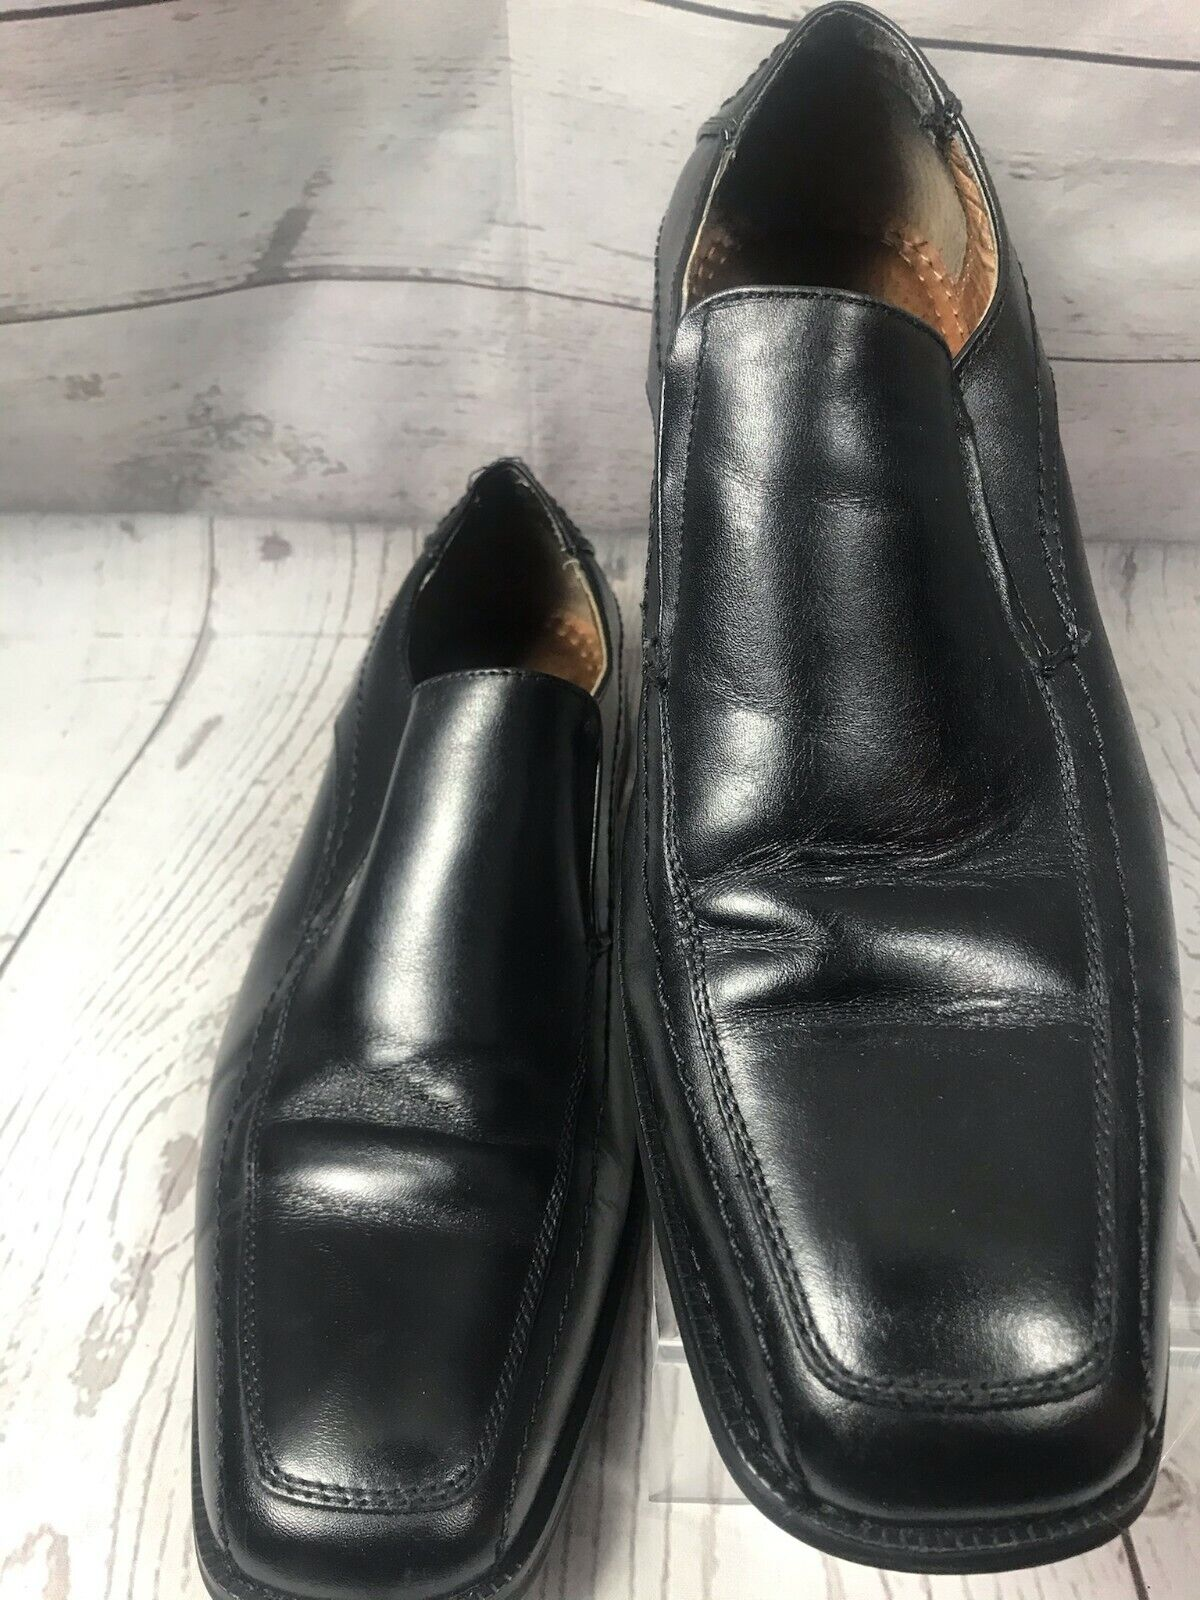 JOSEPH ABBOUD Men's Leather Black Dress Shoe /Size 10M /Man Made Genuine Leather